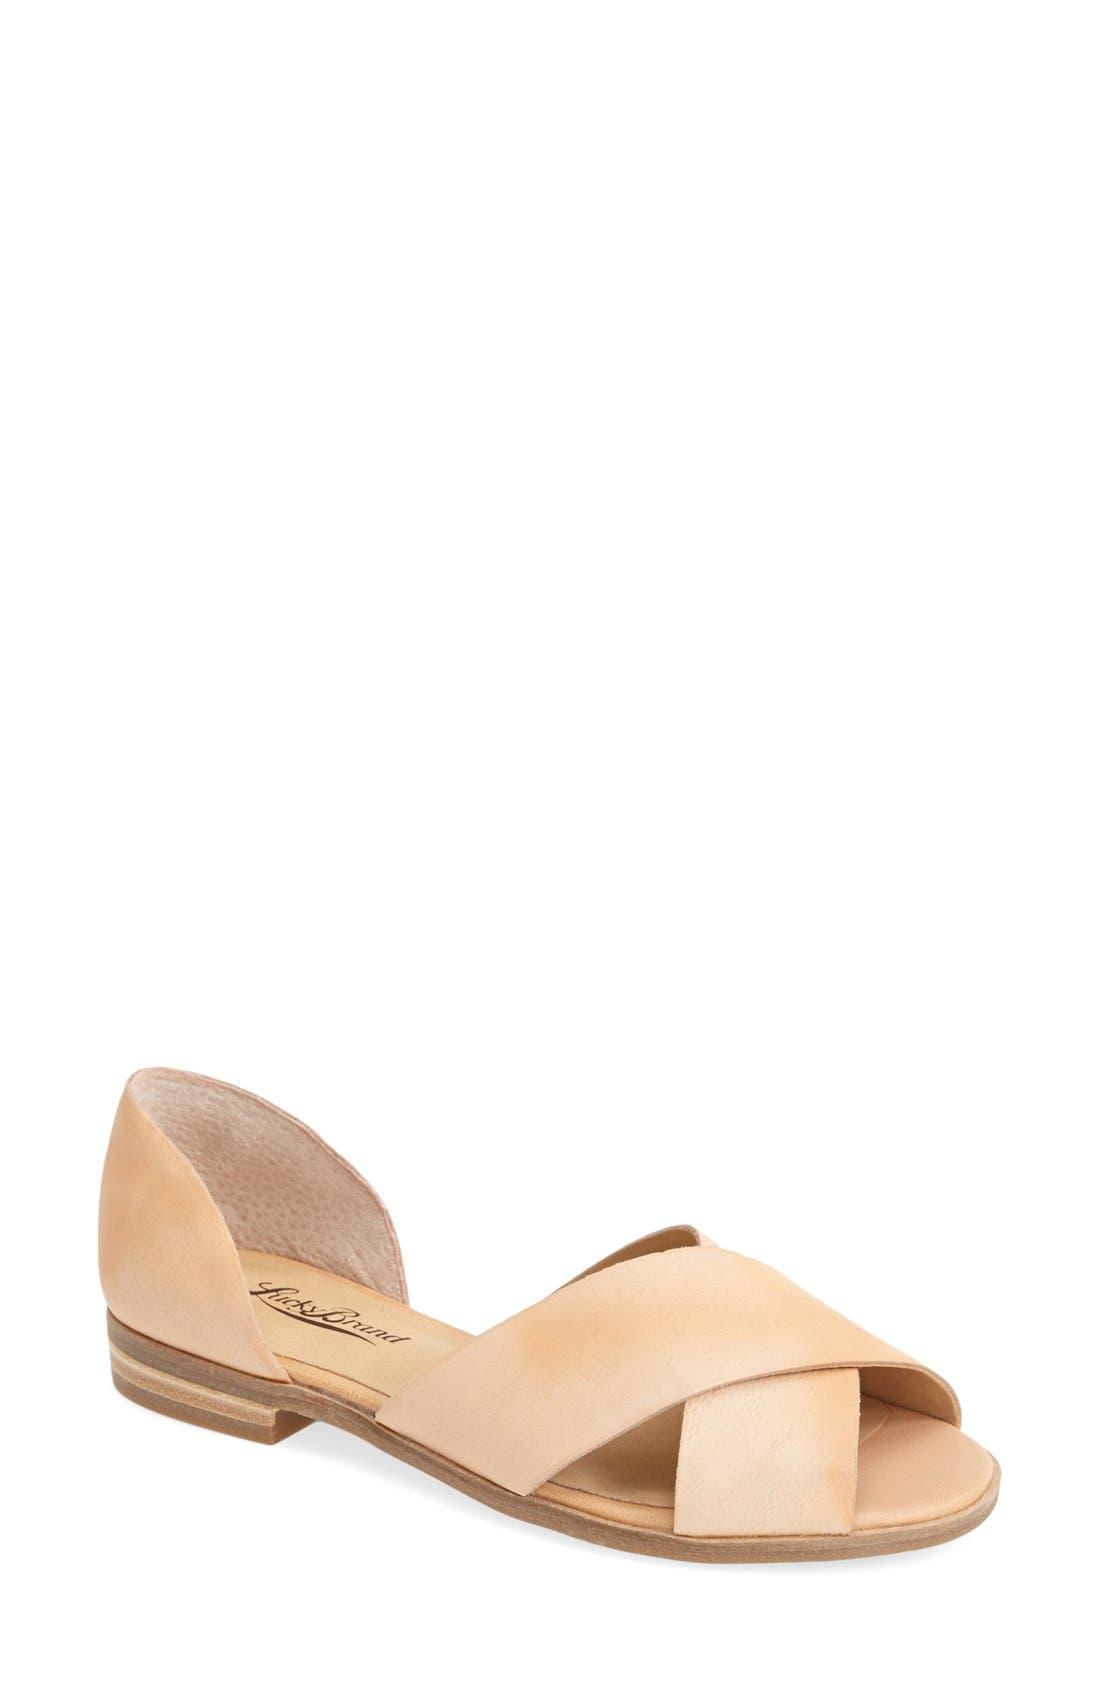 Alternate Image 1 Selected - Lucky Brand 'Silla' Leather Cross Strap Sandal (Women)